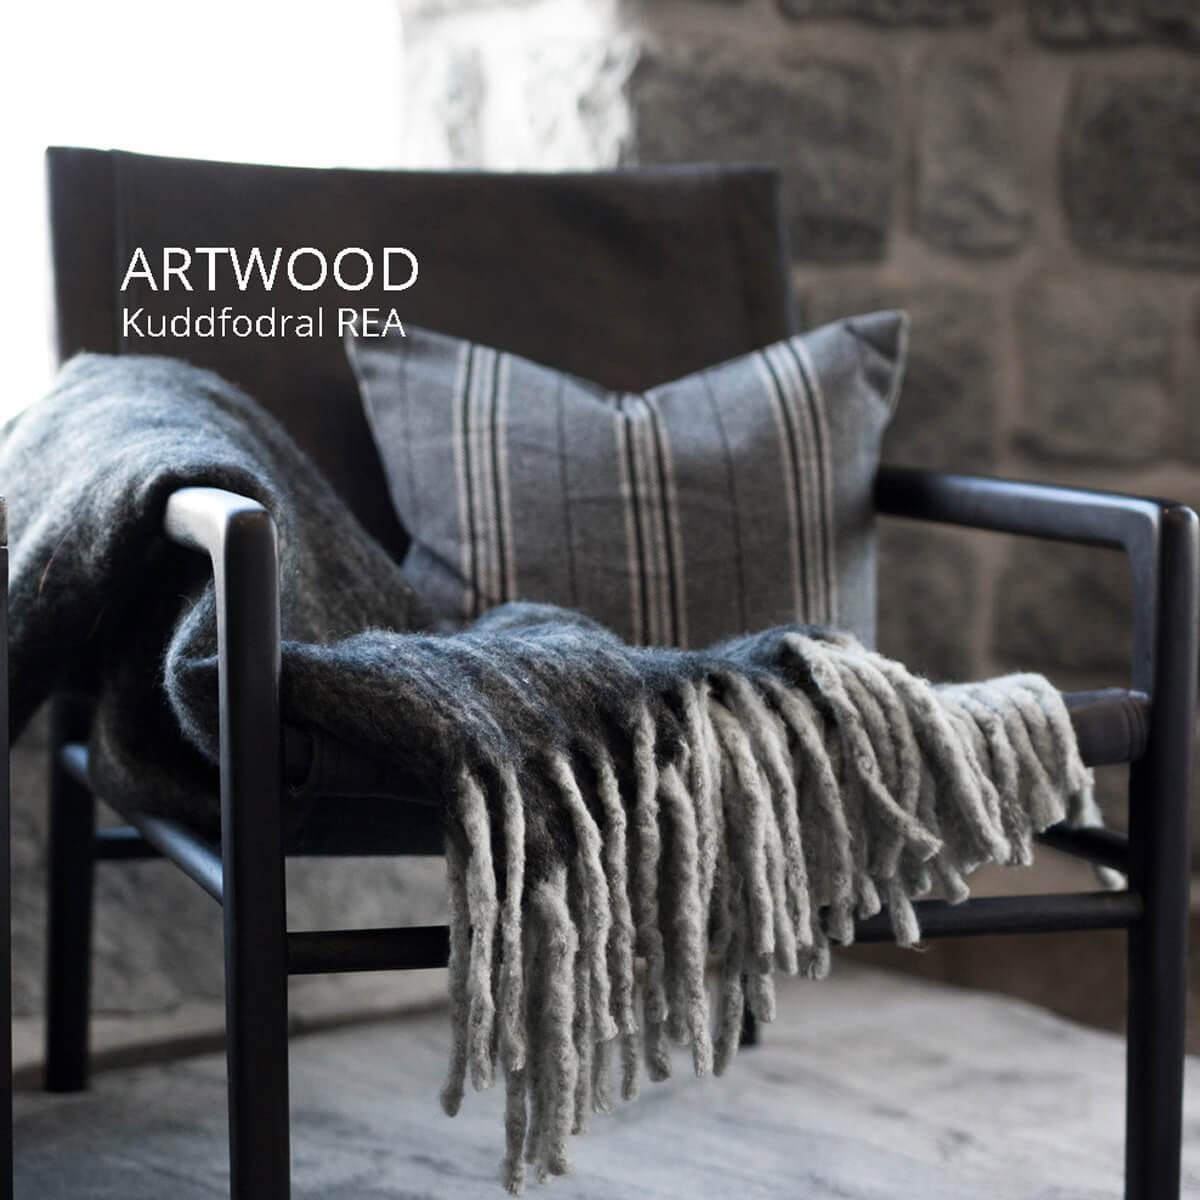 Artwood-kuddfodral-rea